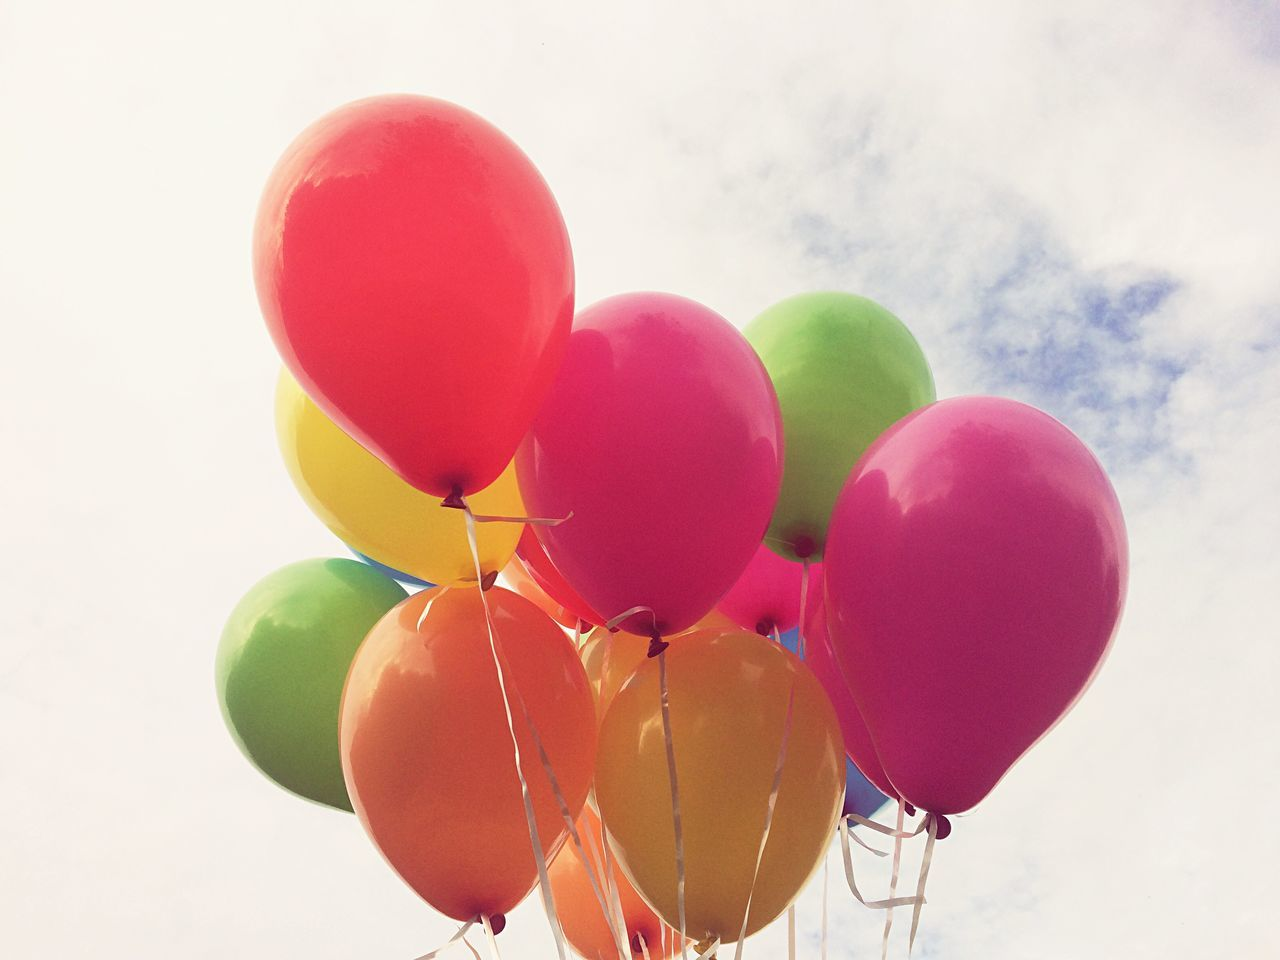 Helium Helium Balloons Balloon Photography Taking Photos Photo Enjoying Life Clouds Taking Photos Baloons